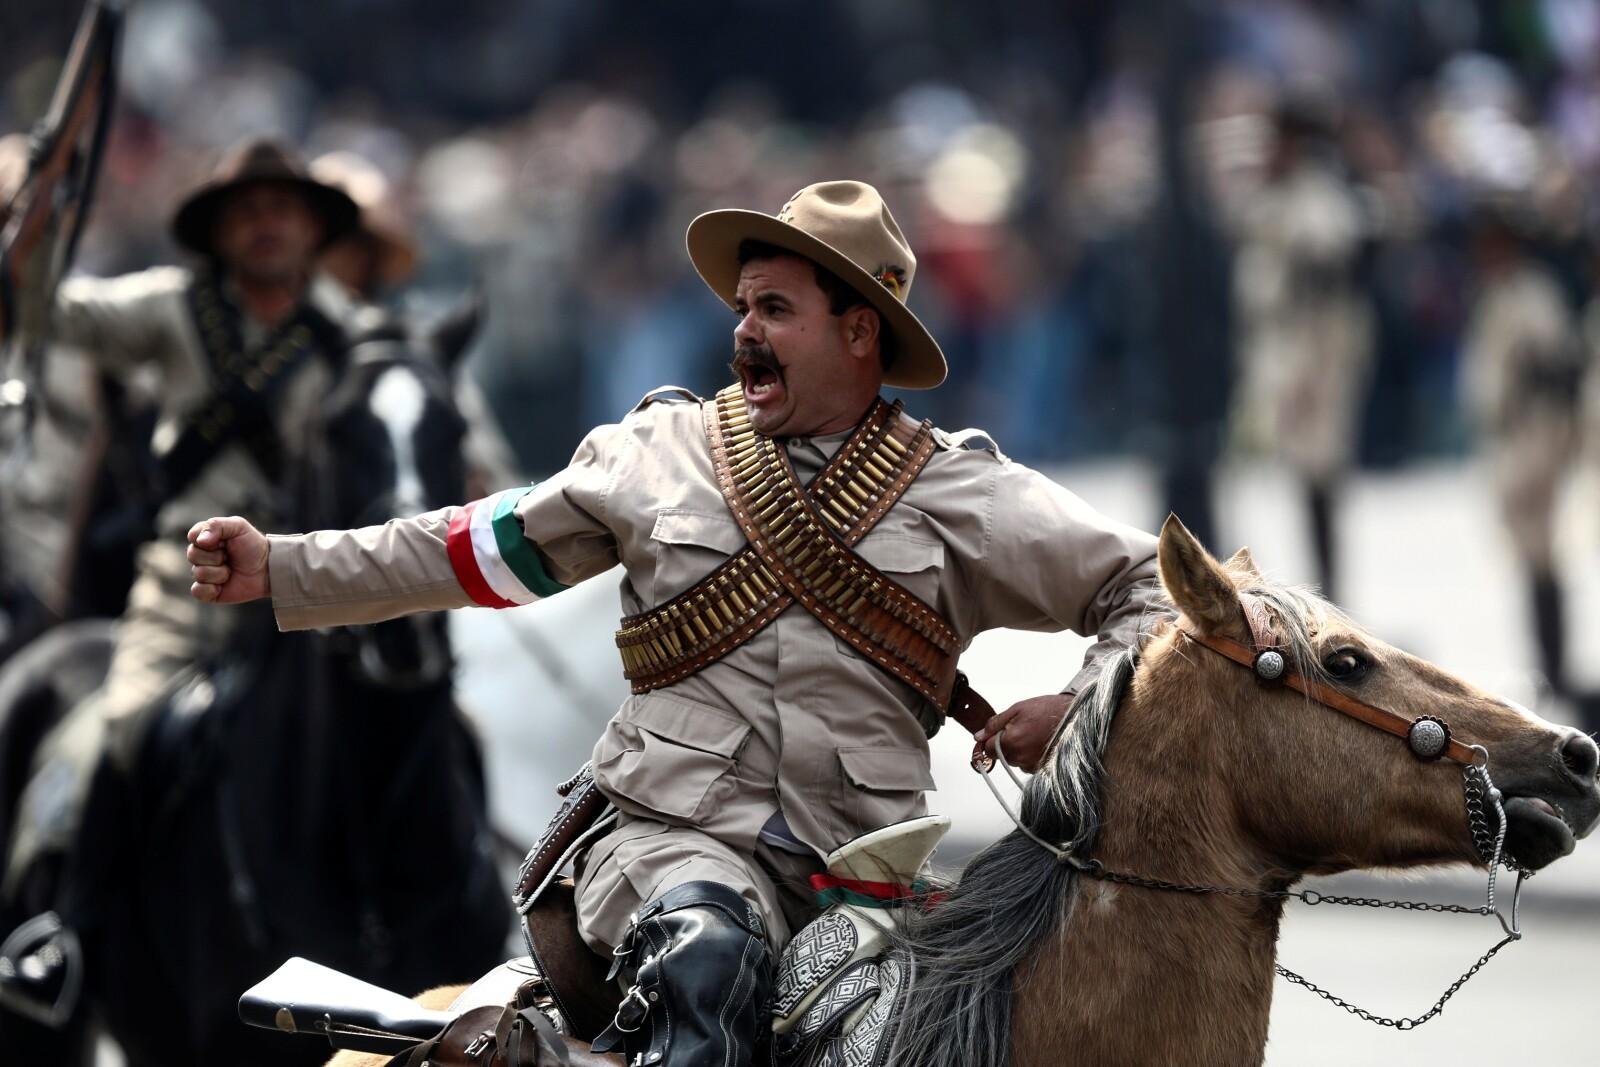 Pancho Vill